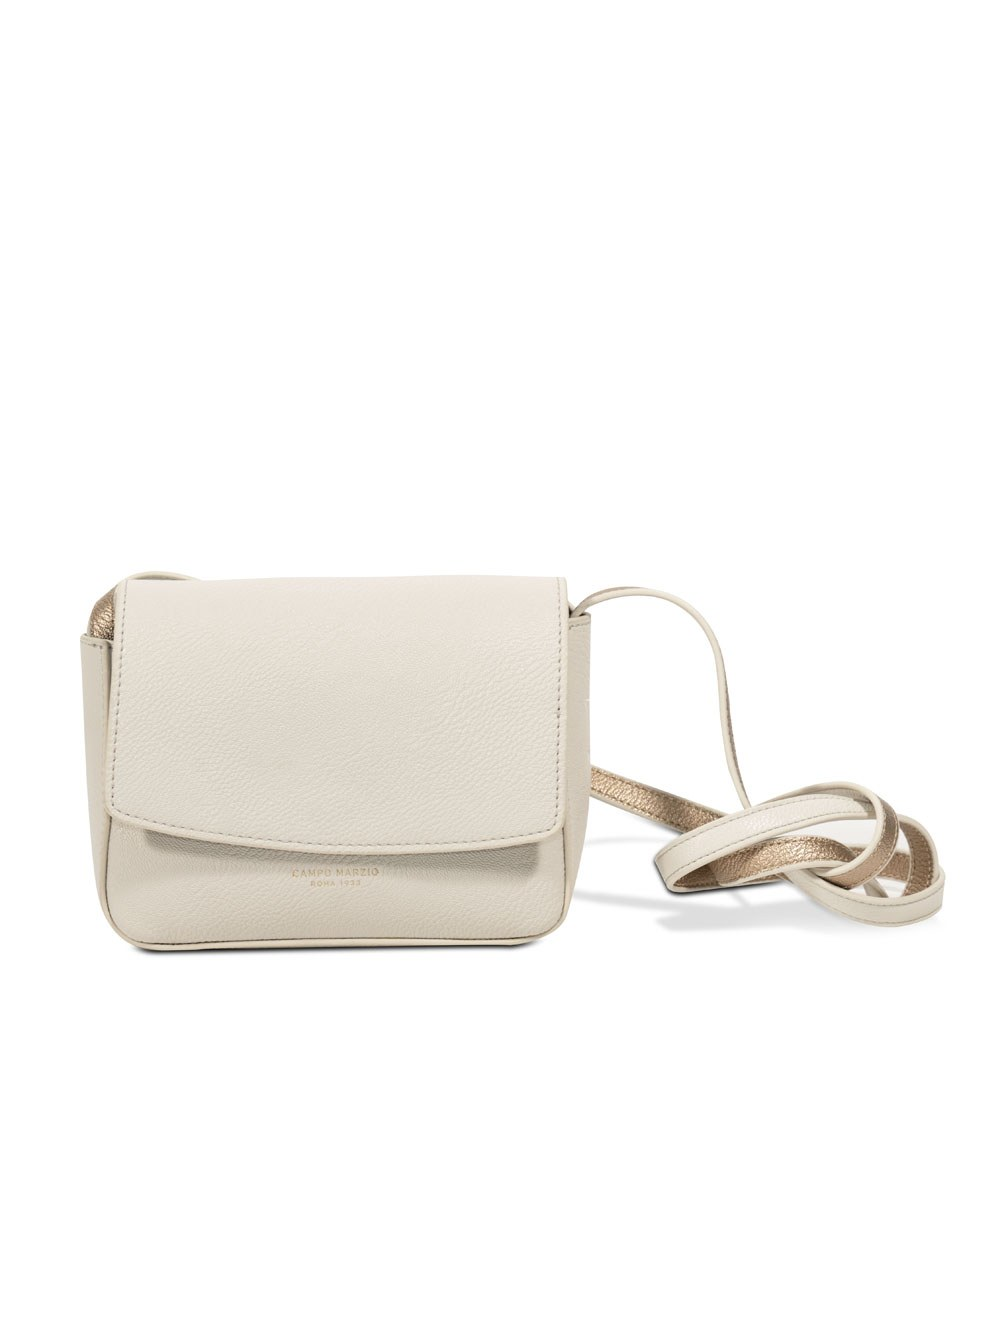 Mini Bag with Crossbody Strap - Off White